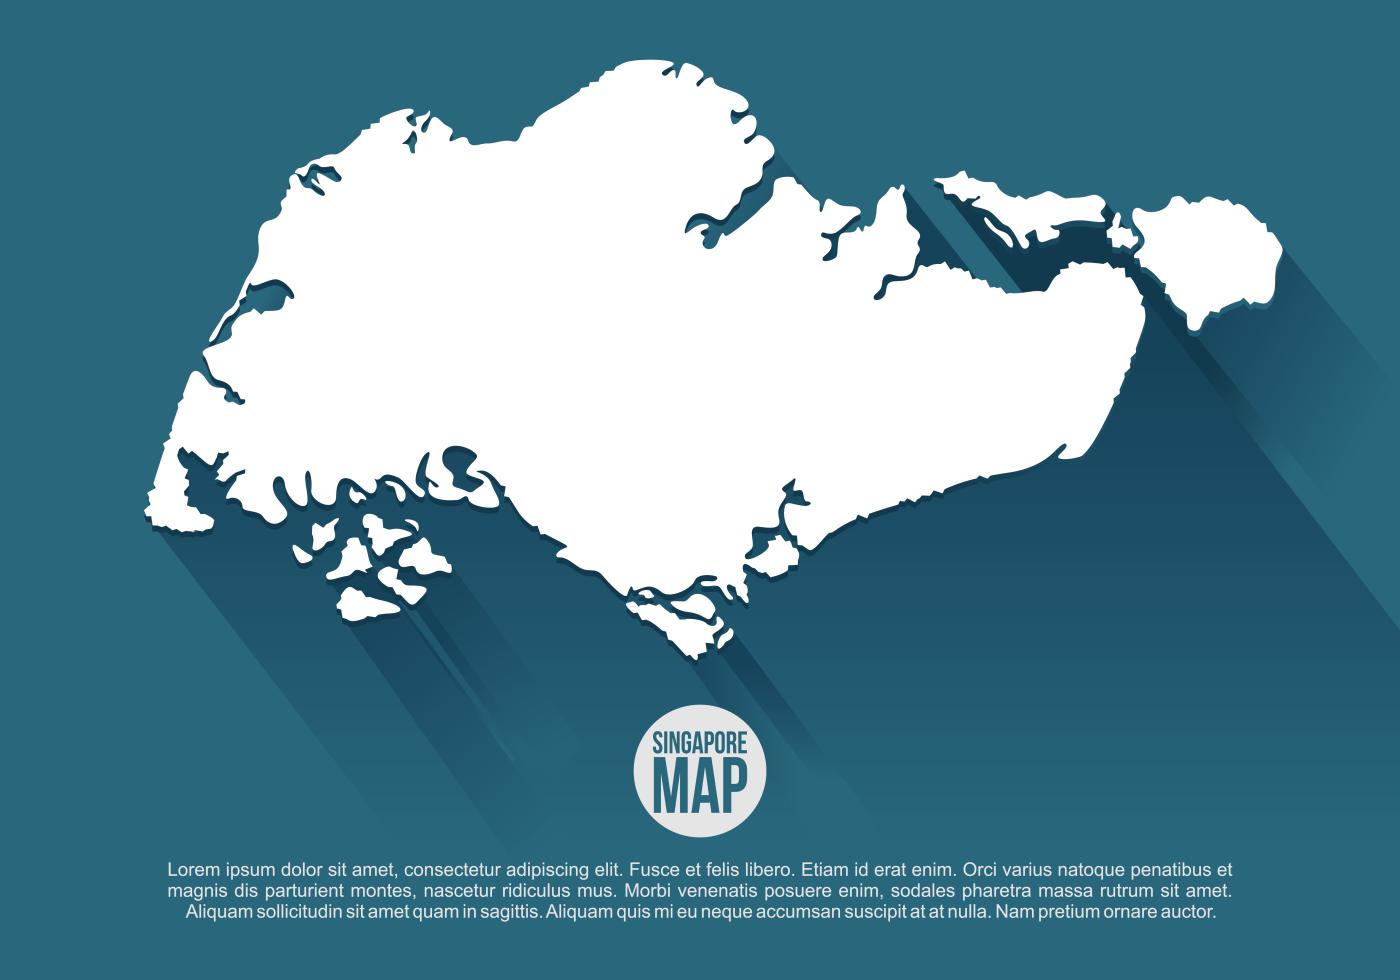 Singapore Map Free Vector Art - (8890 Free Downloads)